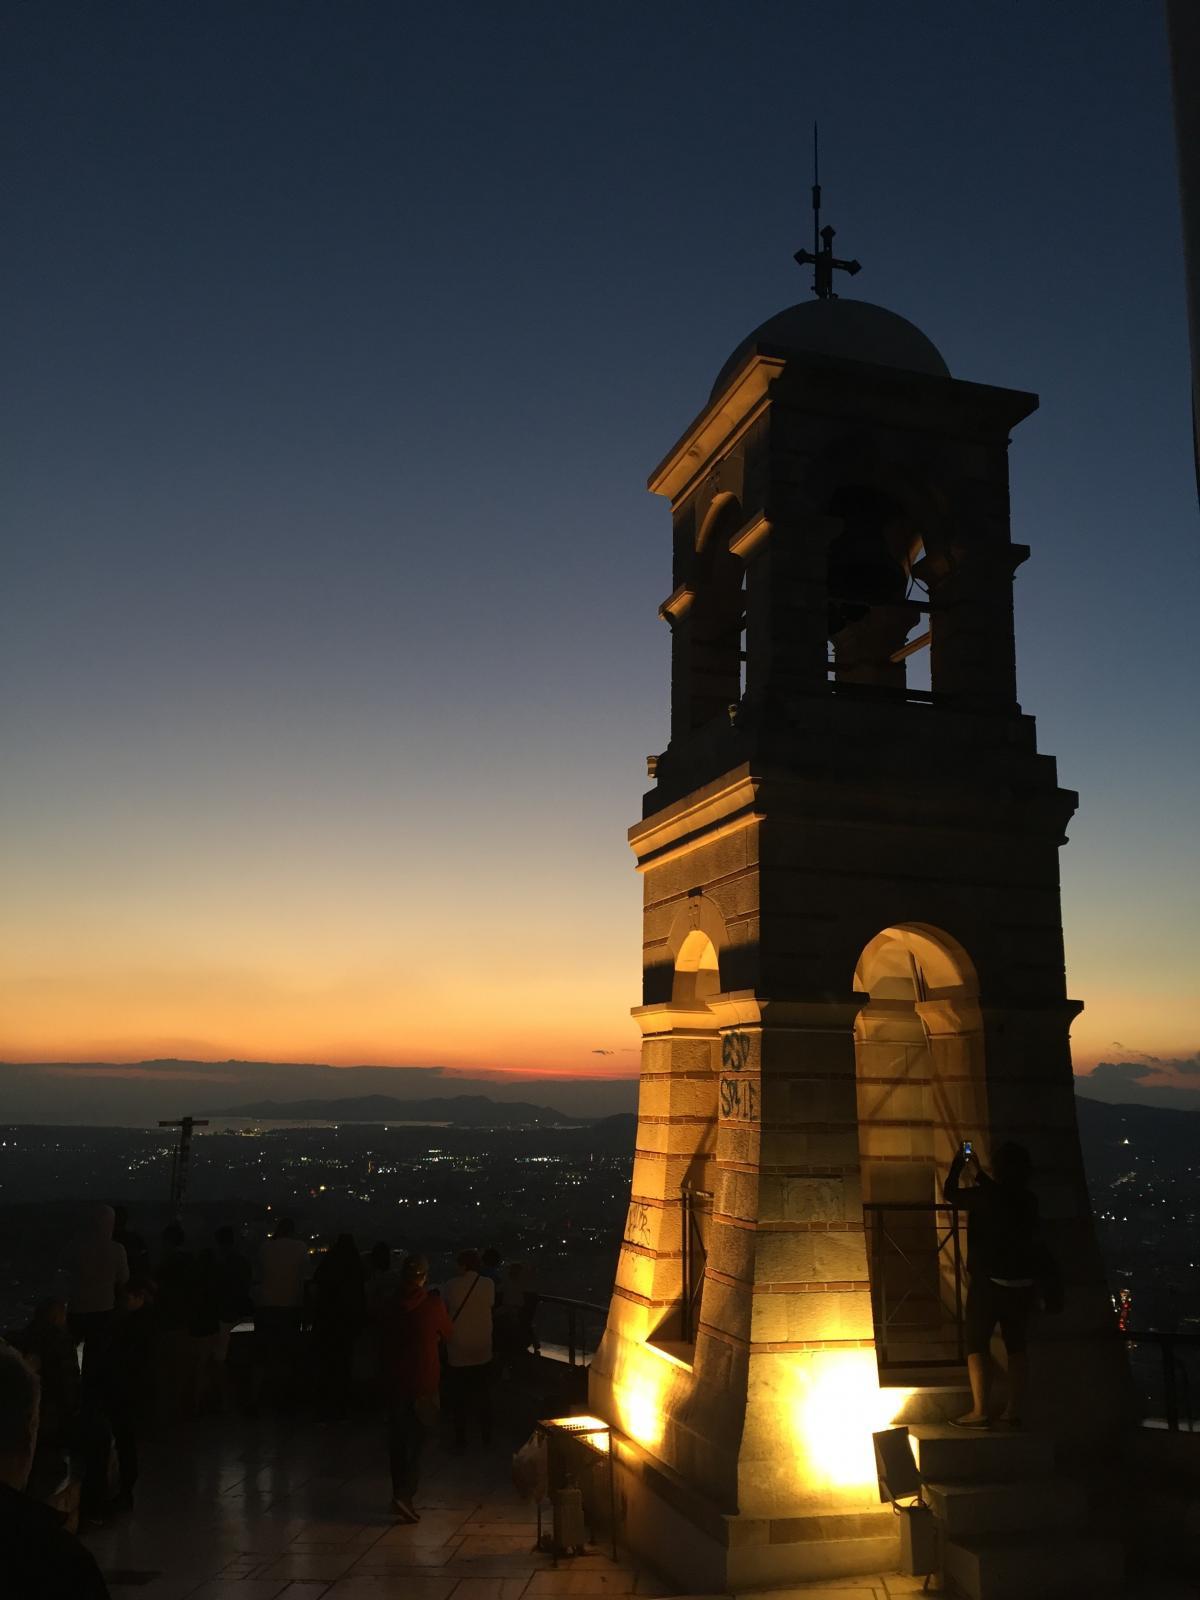 Колокольня церкви Святого Георгия на закате / фото Маргарита Андреева